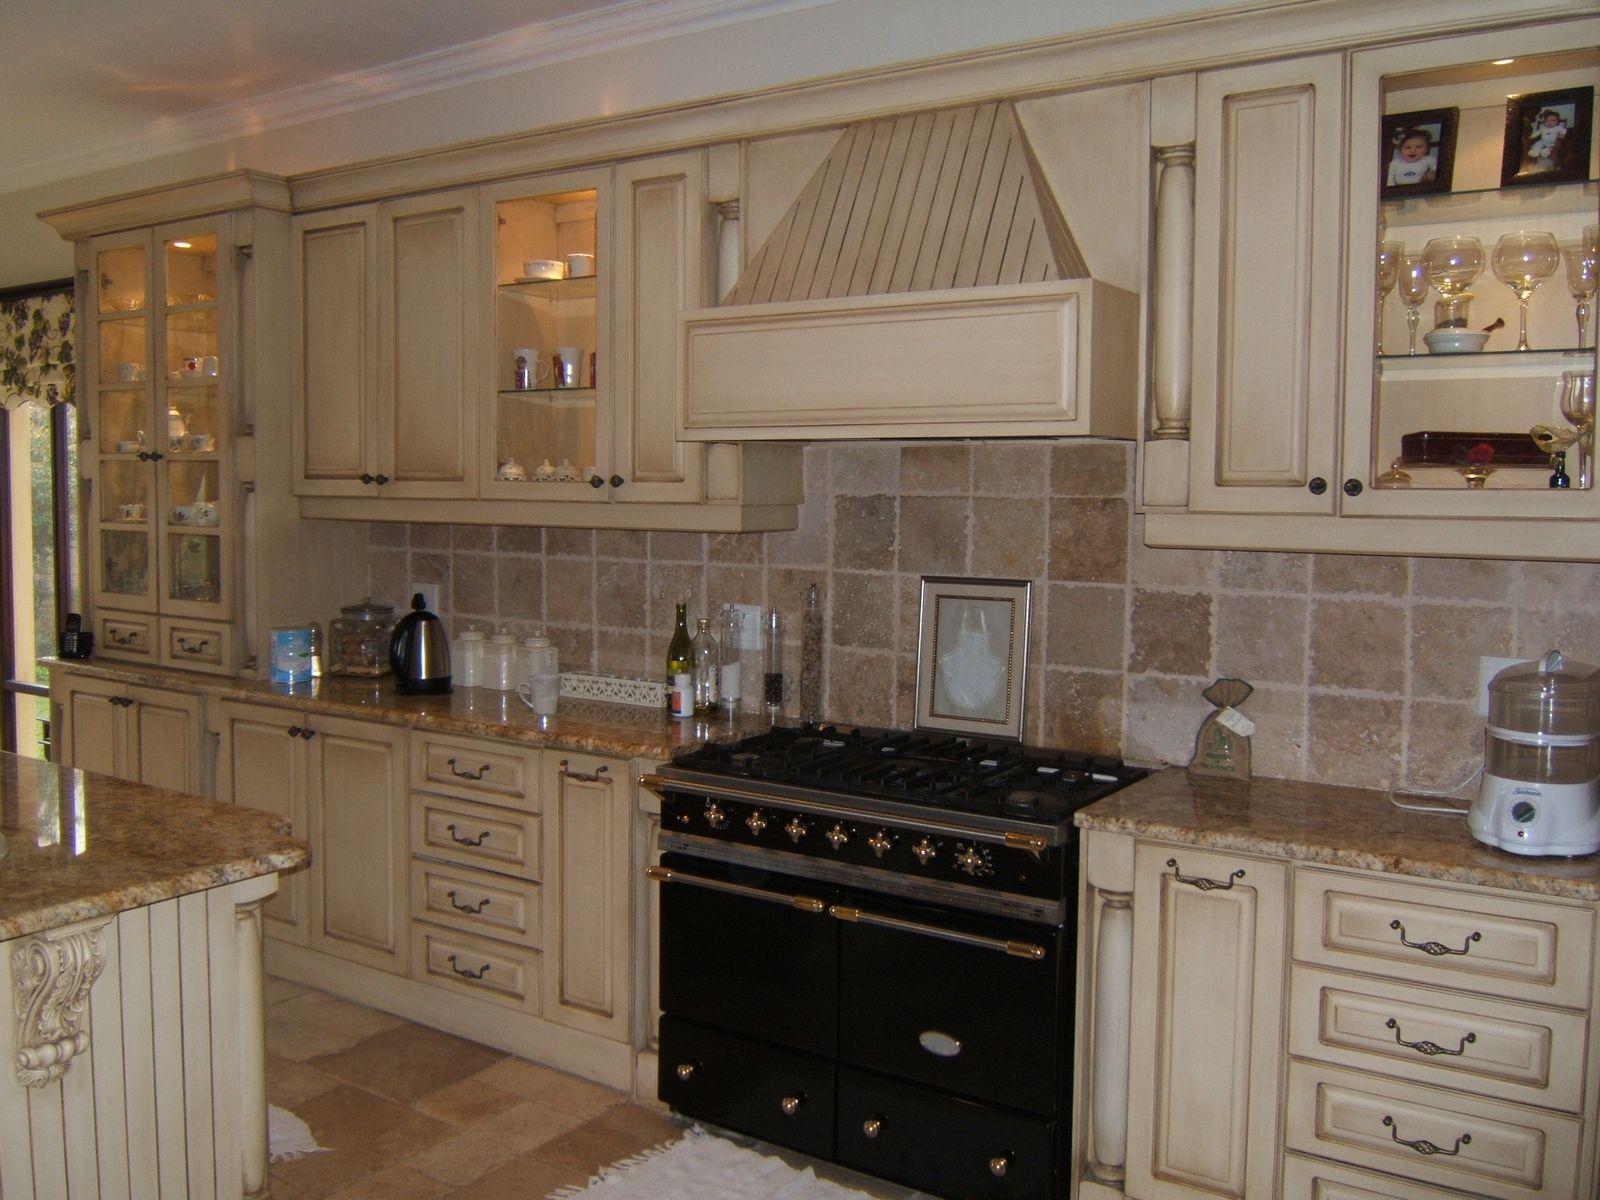 country kitchen backsplash designs photo - 3